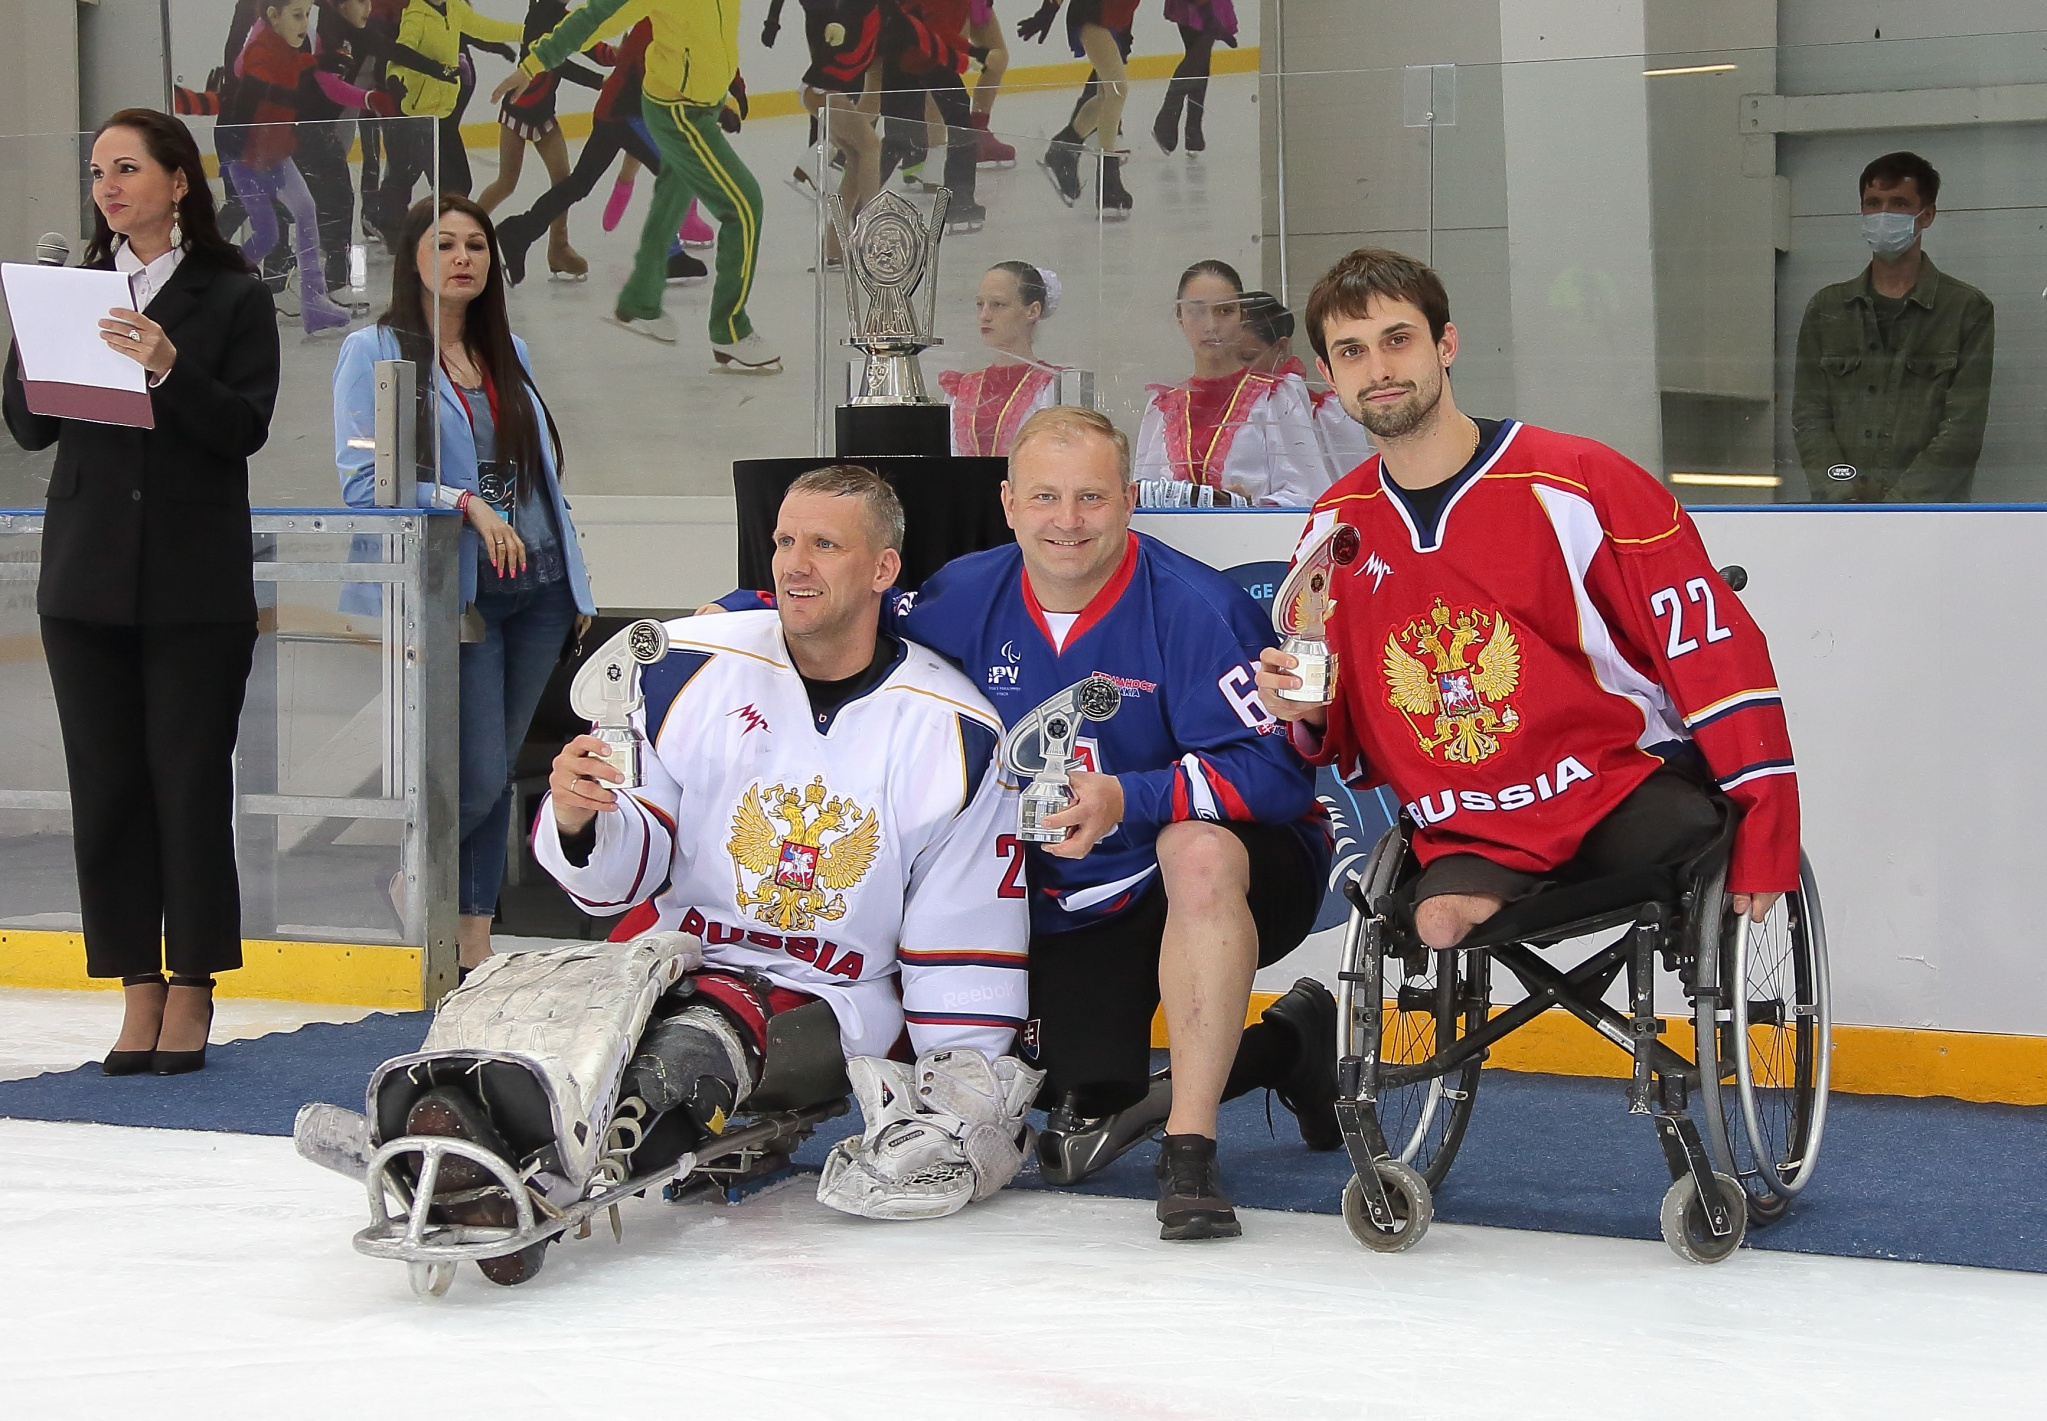 Владимир Каманцев, Славомир Ференчик и Николай Терентьев. Фото: Дмитрий Бондаренко